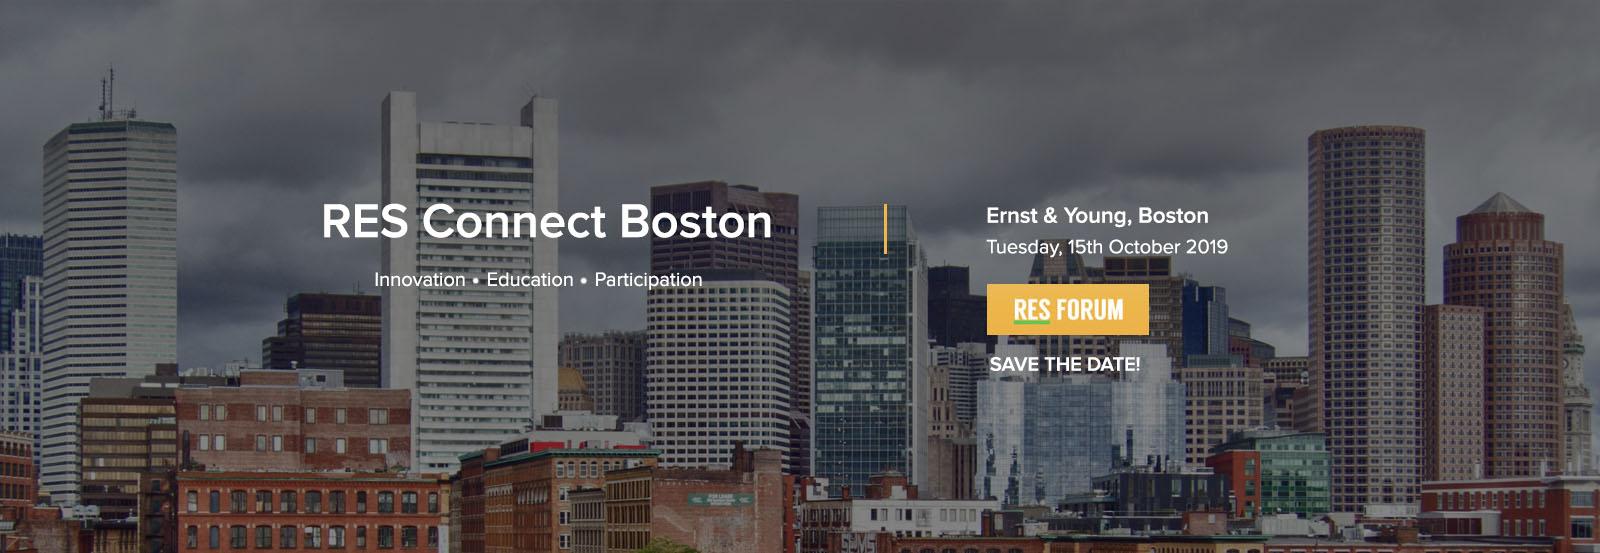 res-banner-boston-1